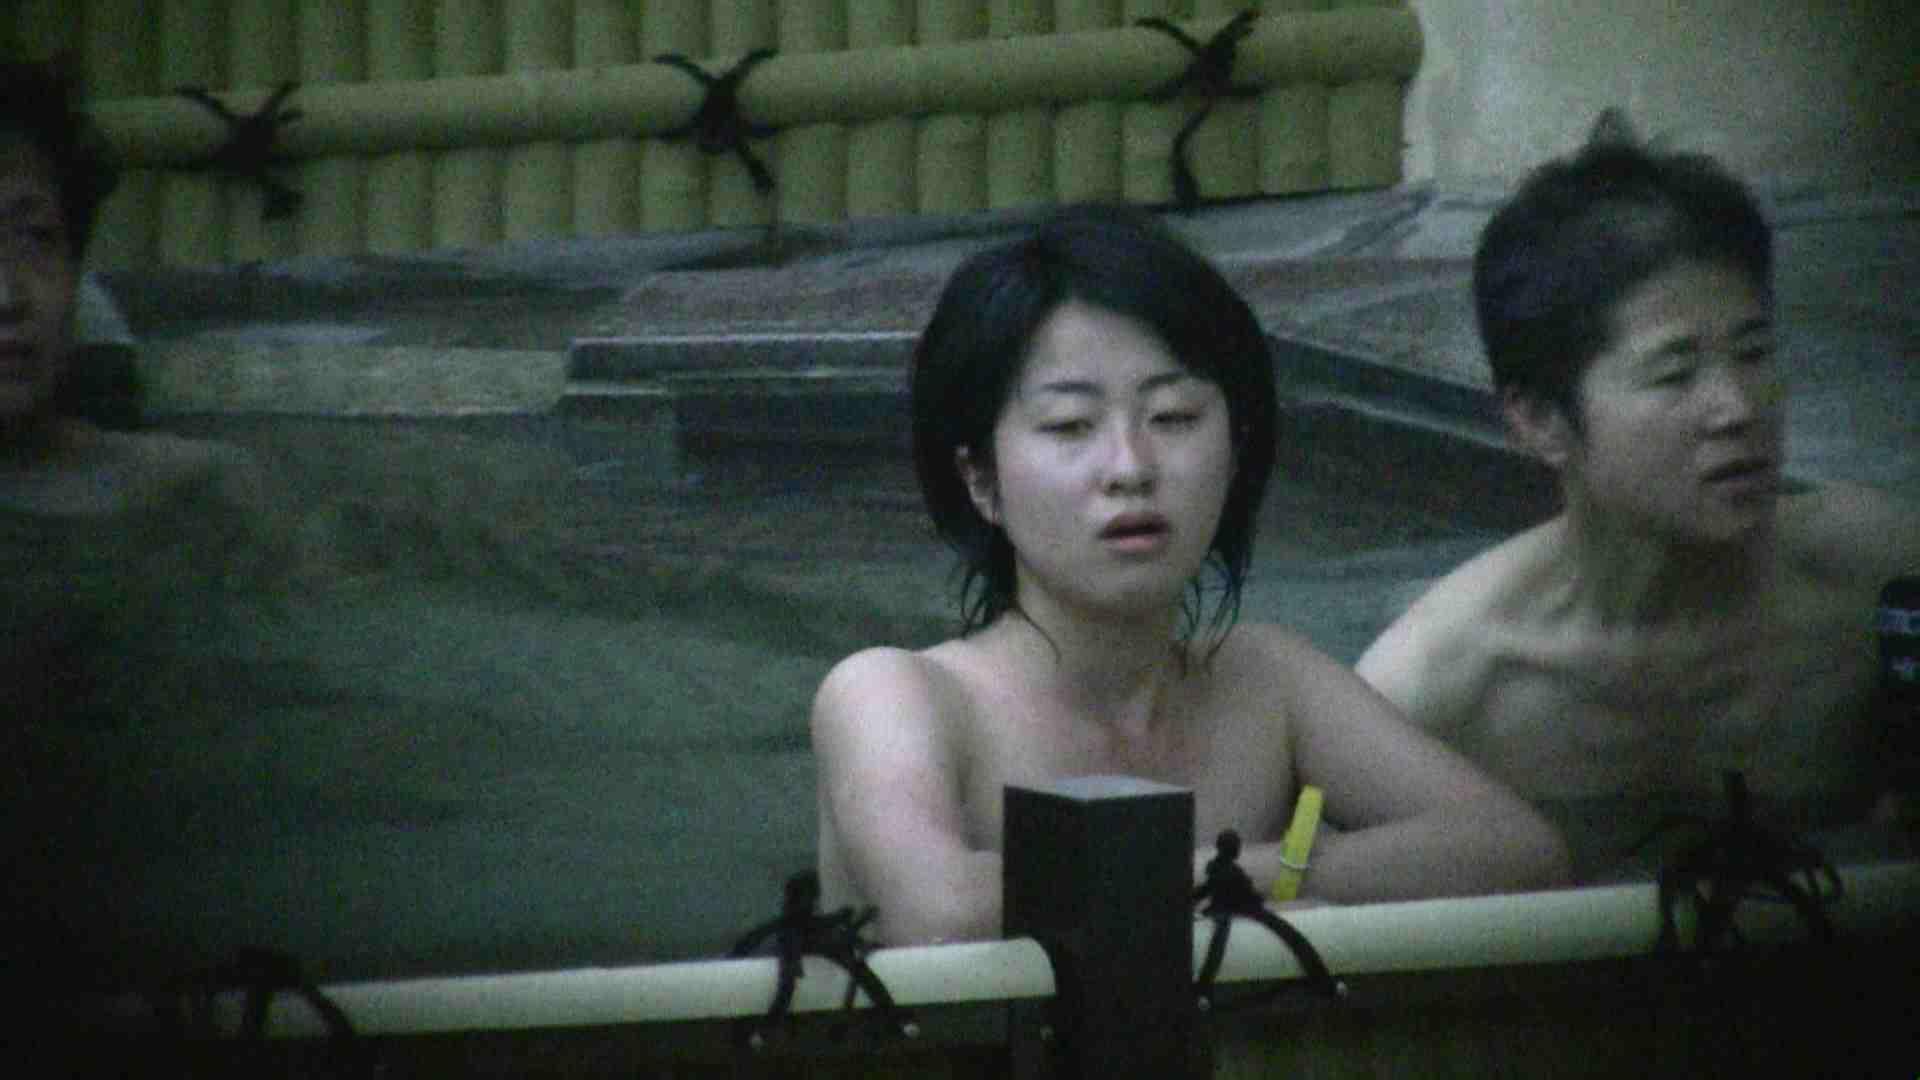 Aquaな露天風呂Vol.112 0  68連発 34